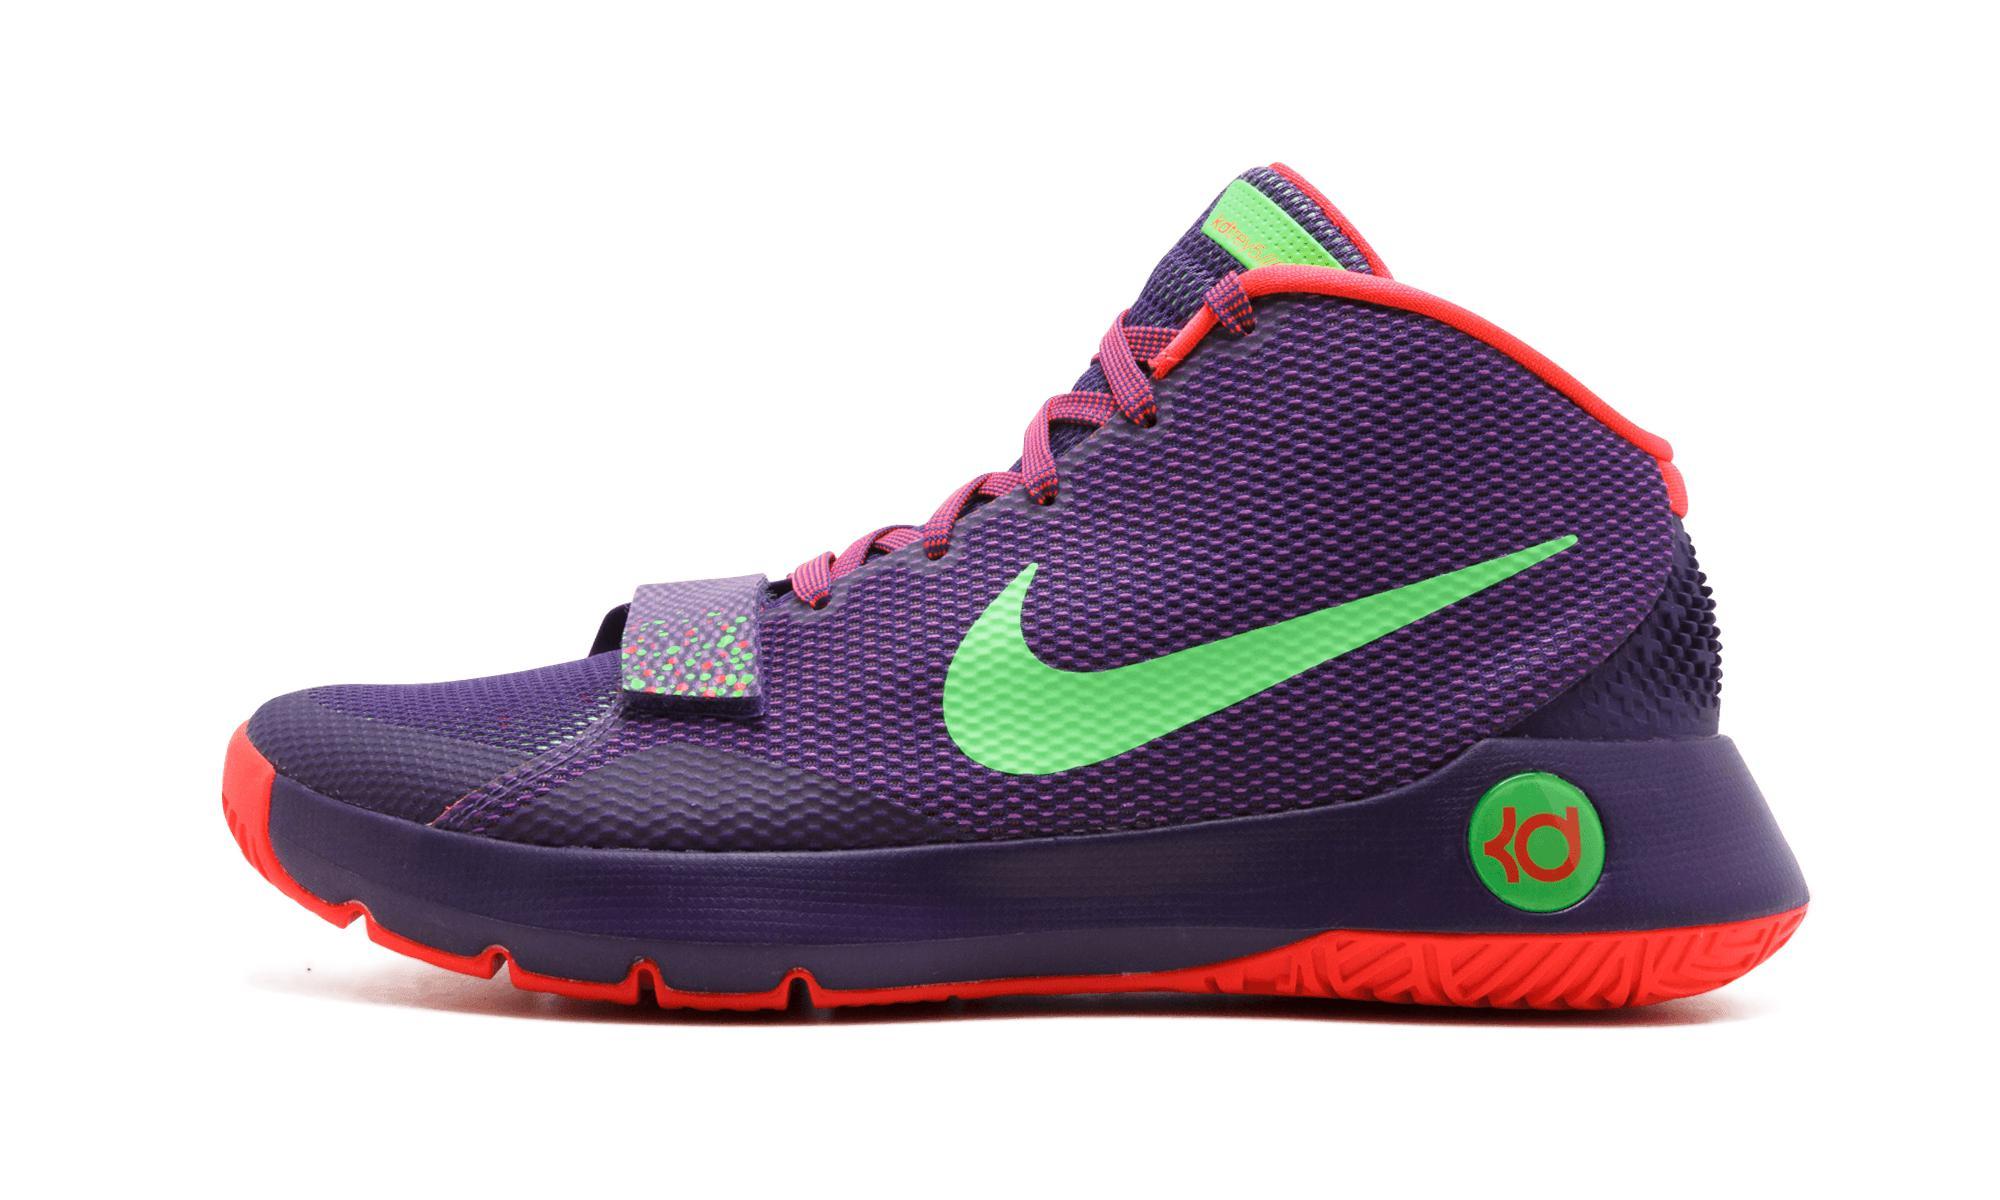 864caff40224 Lyst - Nike Kd Trey 5 Iii for Men